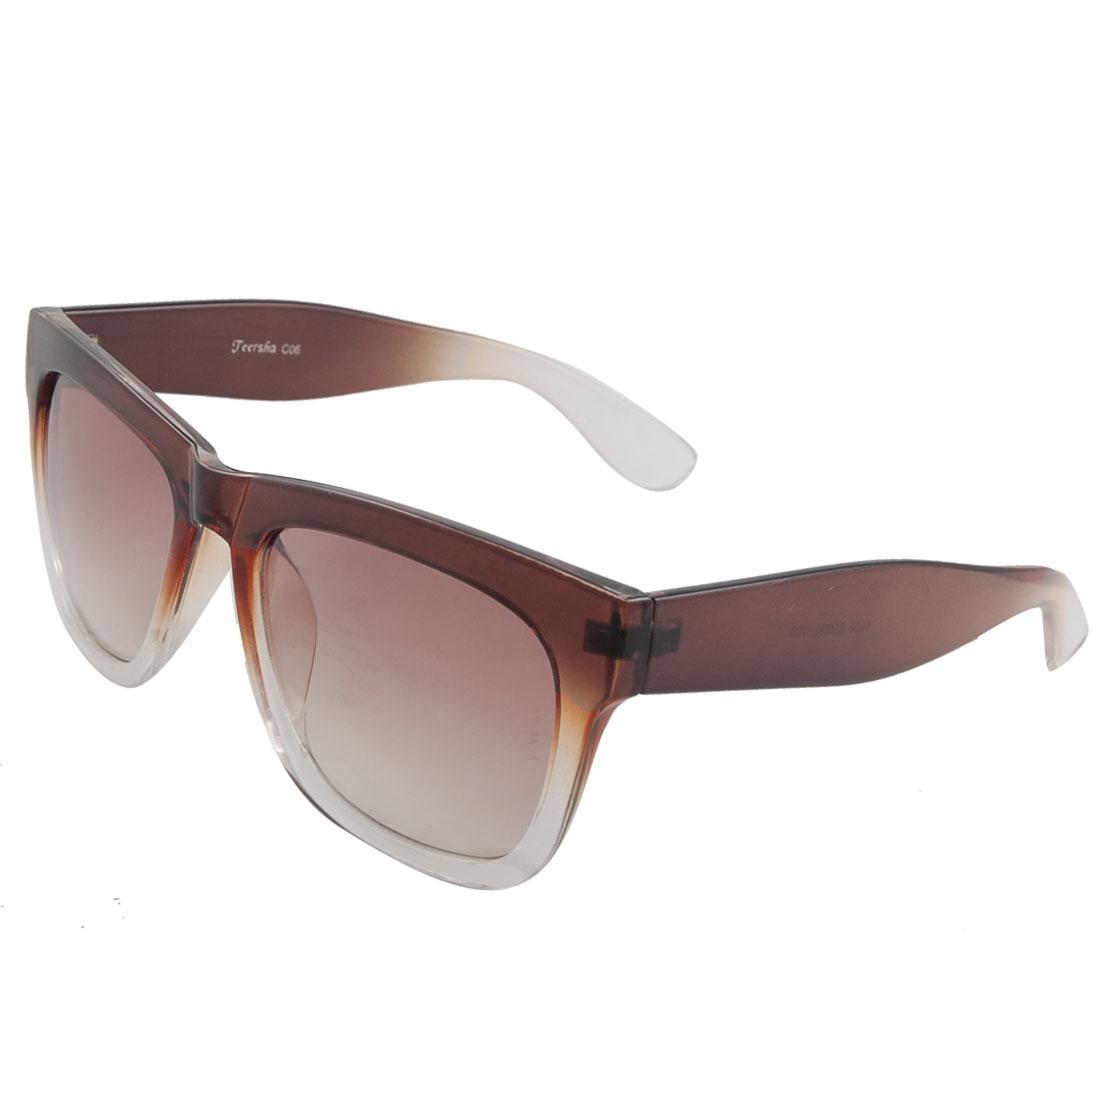 Woman Brown Clear Plastic Full Rim Frame Sunglasses